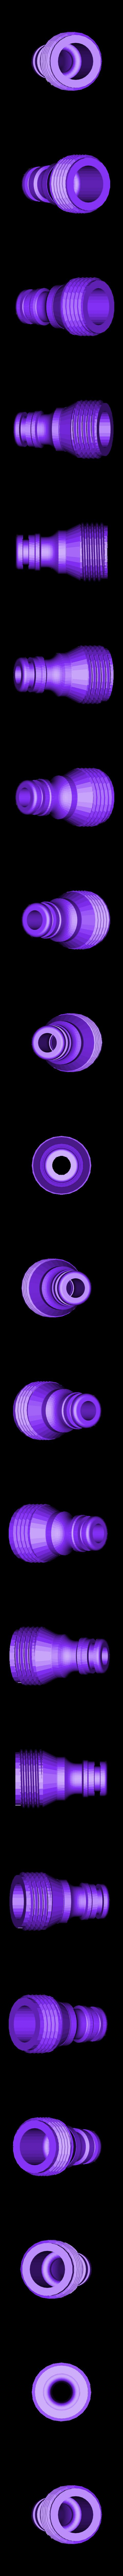 emboutM3_4.stl Download free STL file Garden connection 3/4 MM • 3D print design, GabuZome